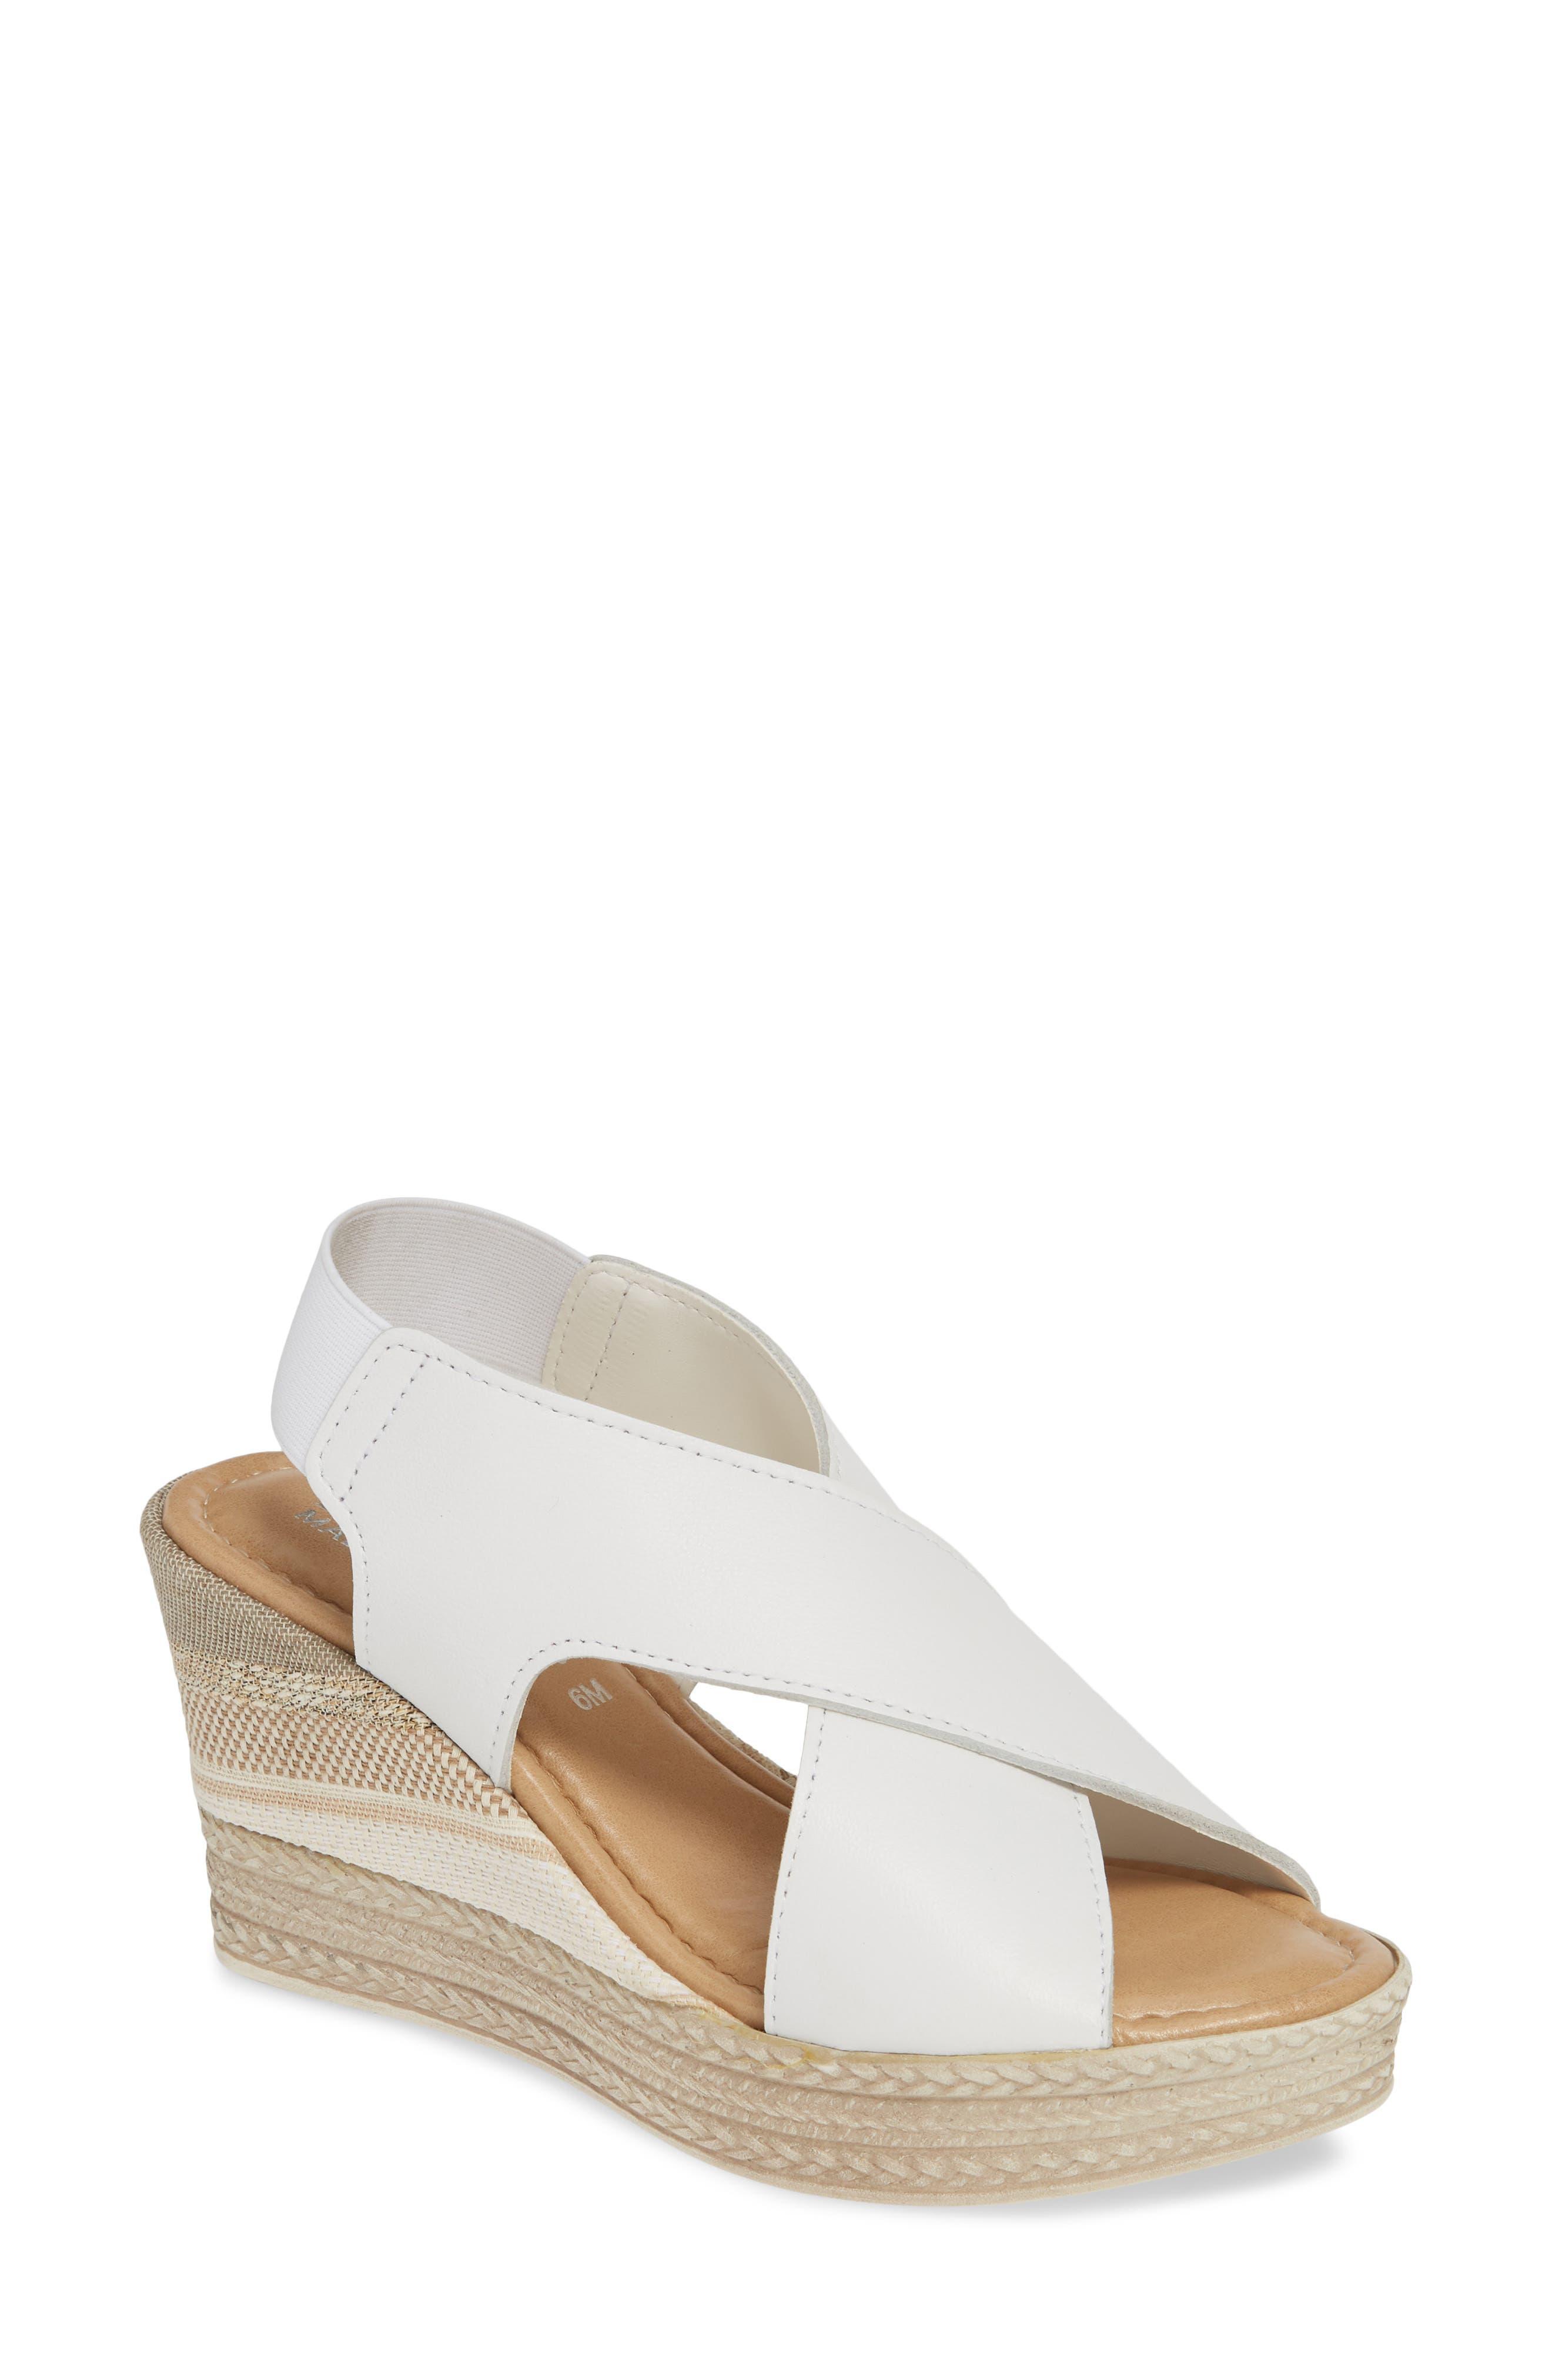 Bella Vita Slingback Sandal, White